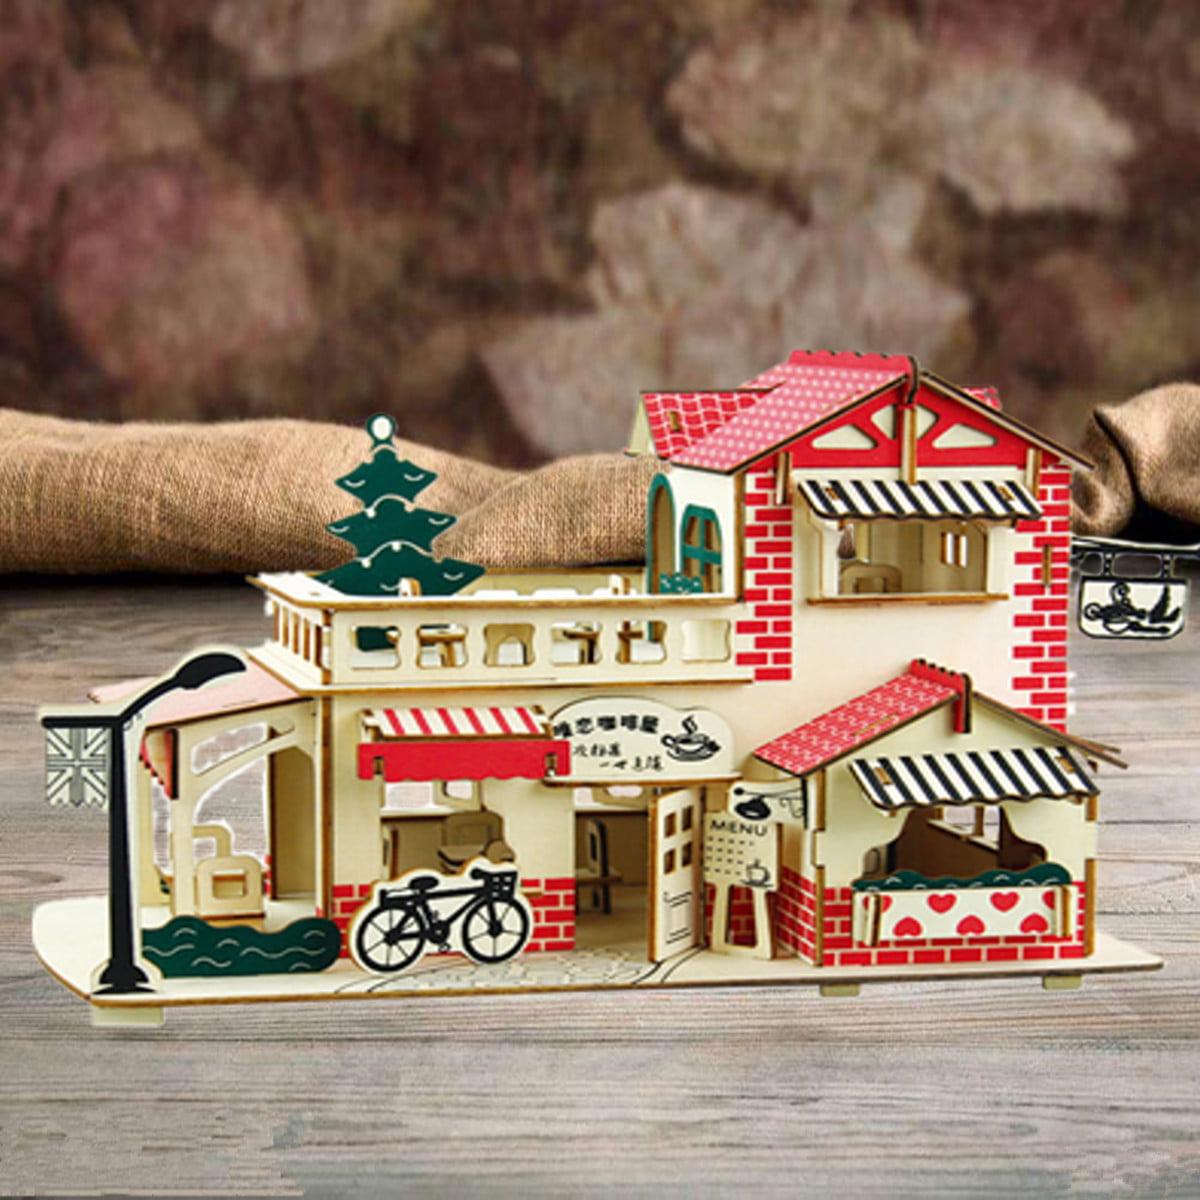 DIY Handcraft Dollhouse Miniature Project My Little 3D Coffee Shop Kids Wooden Dolls House